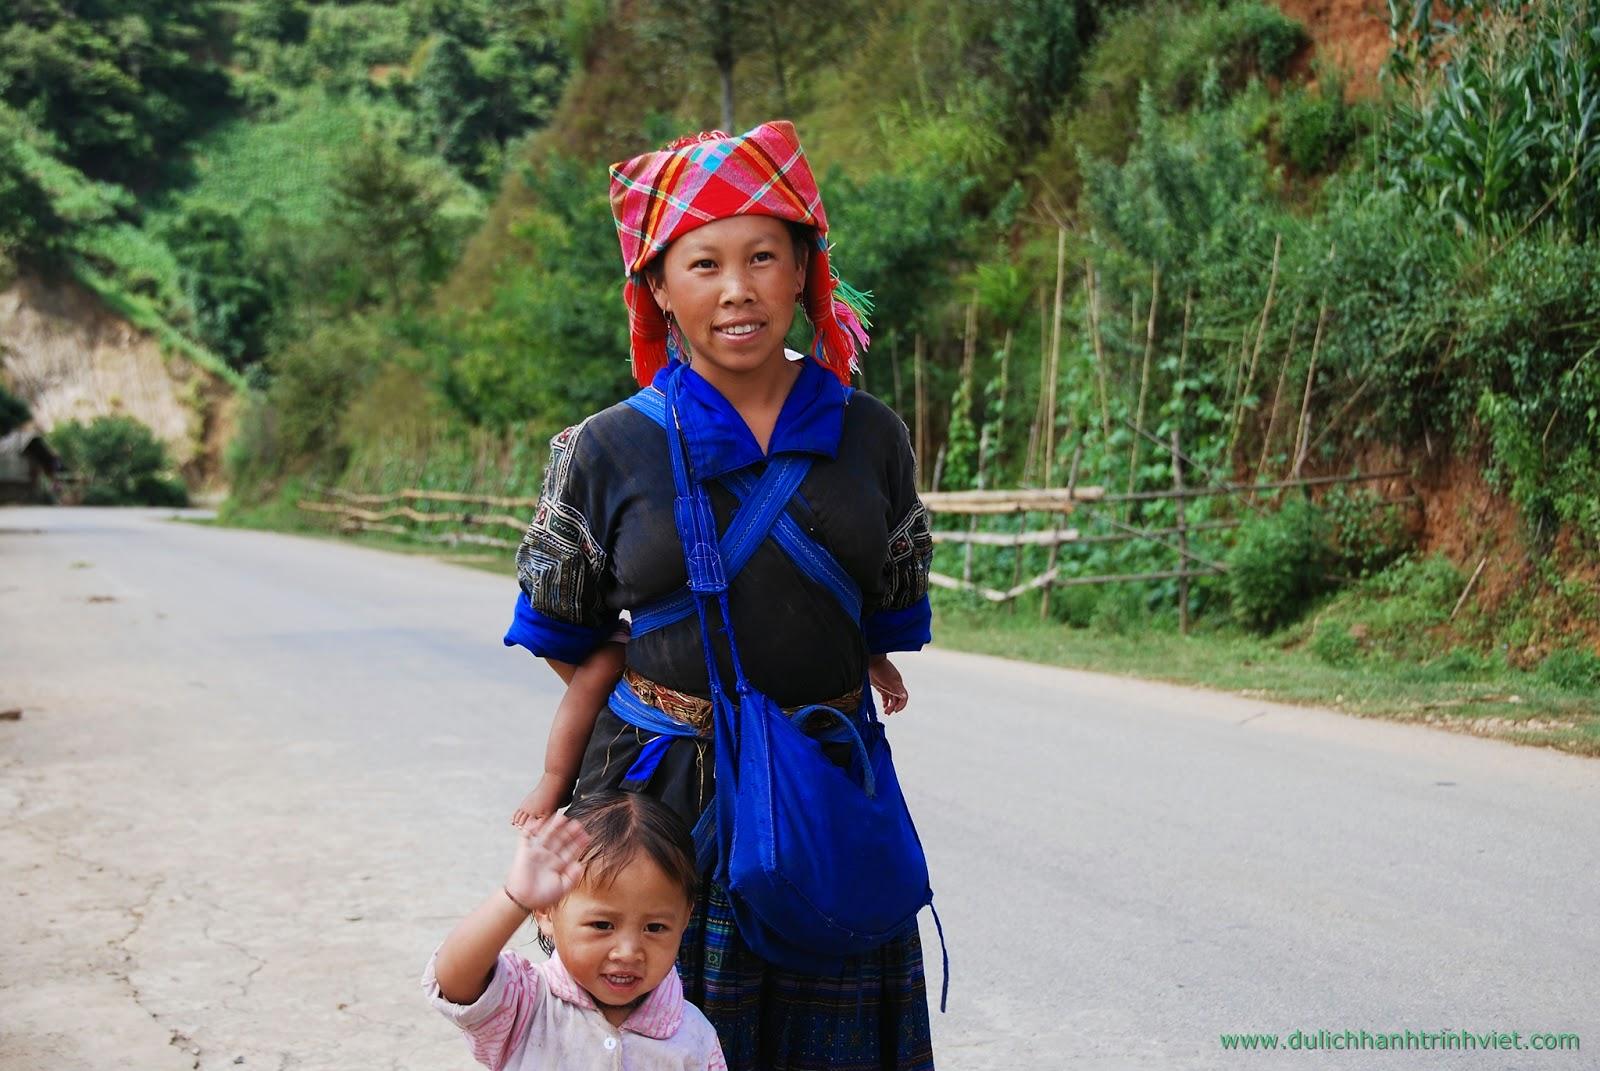 Les charmes de la région Mu Cang Chai